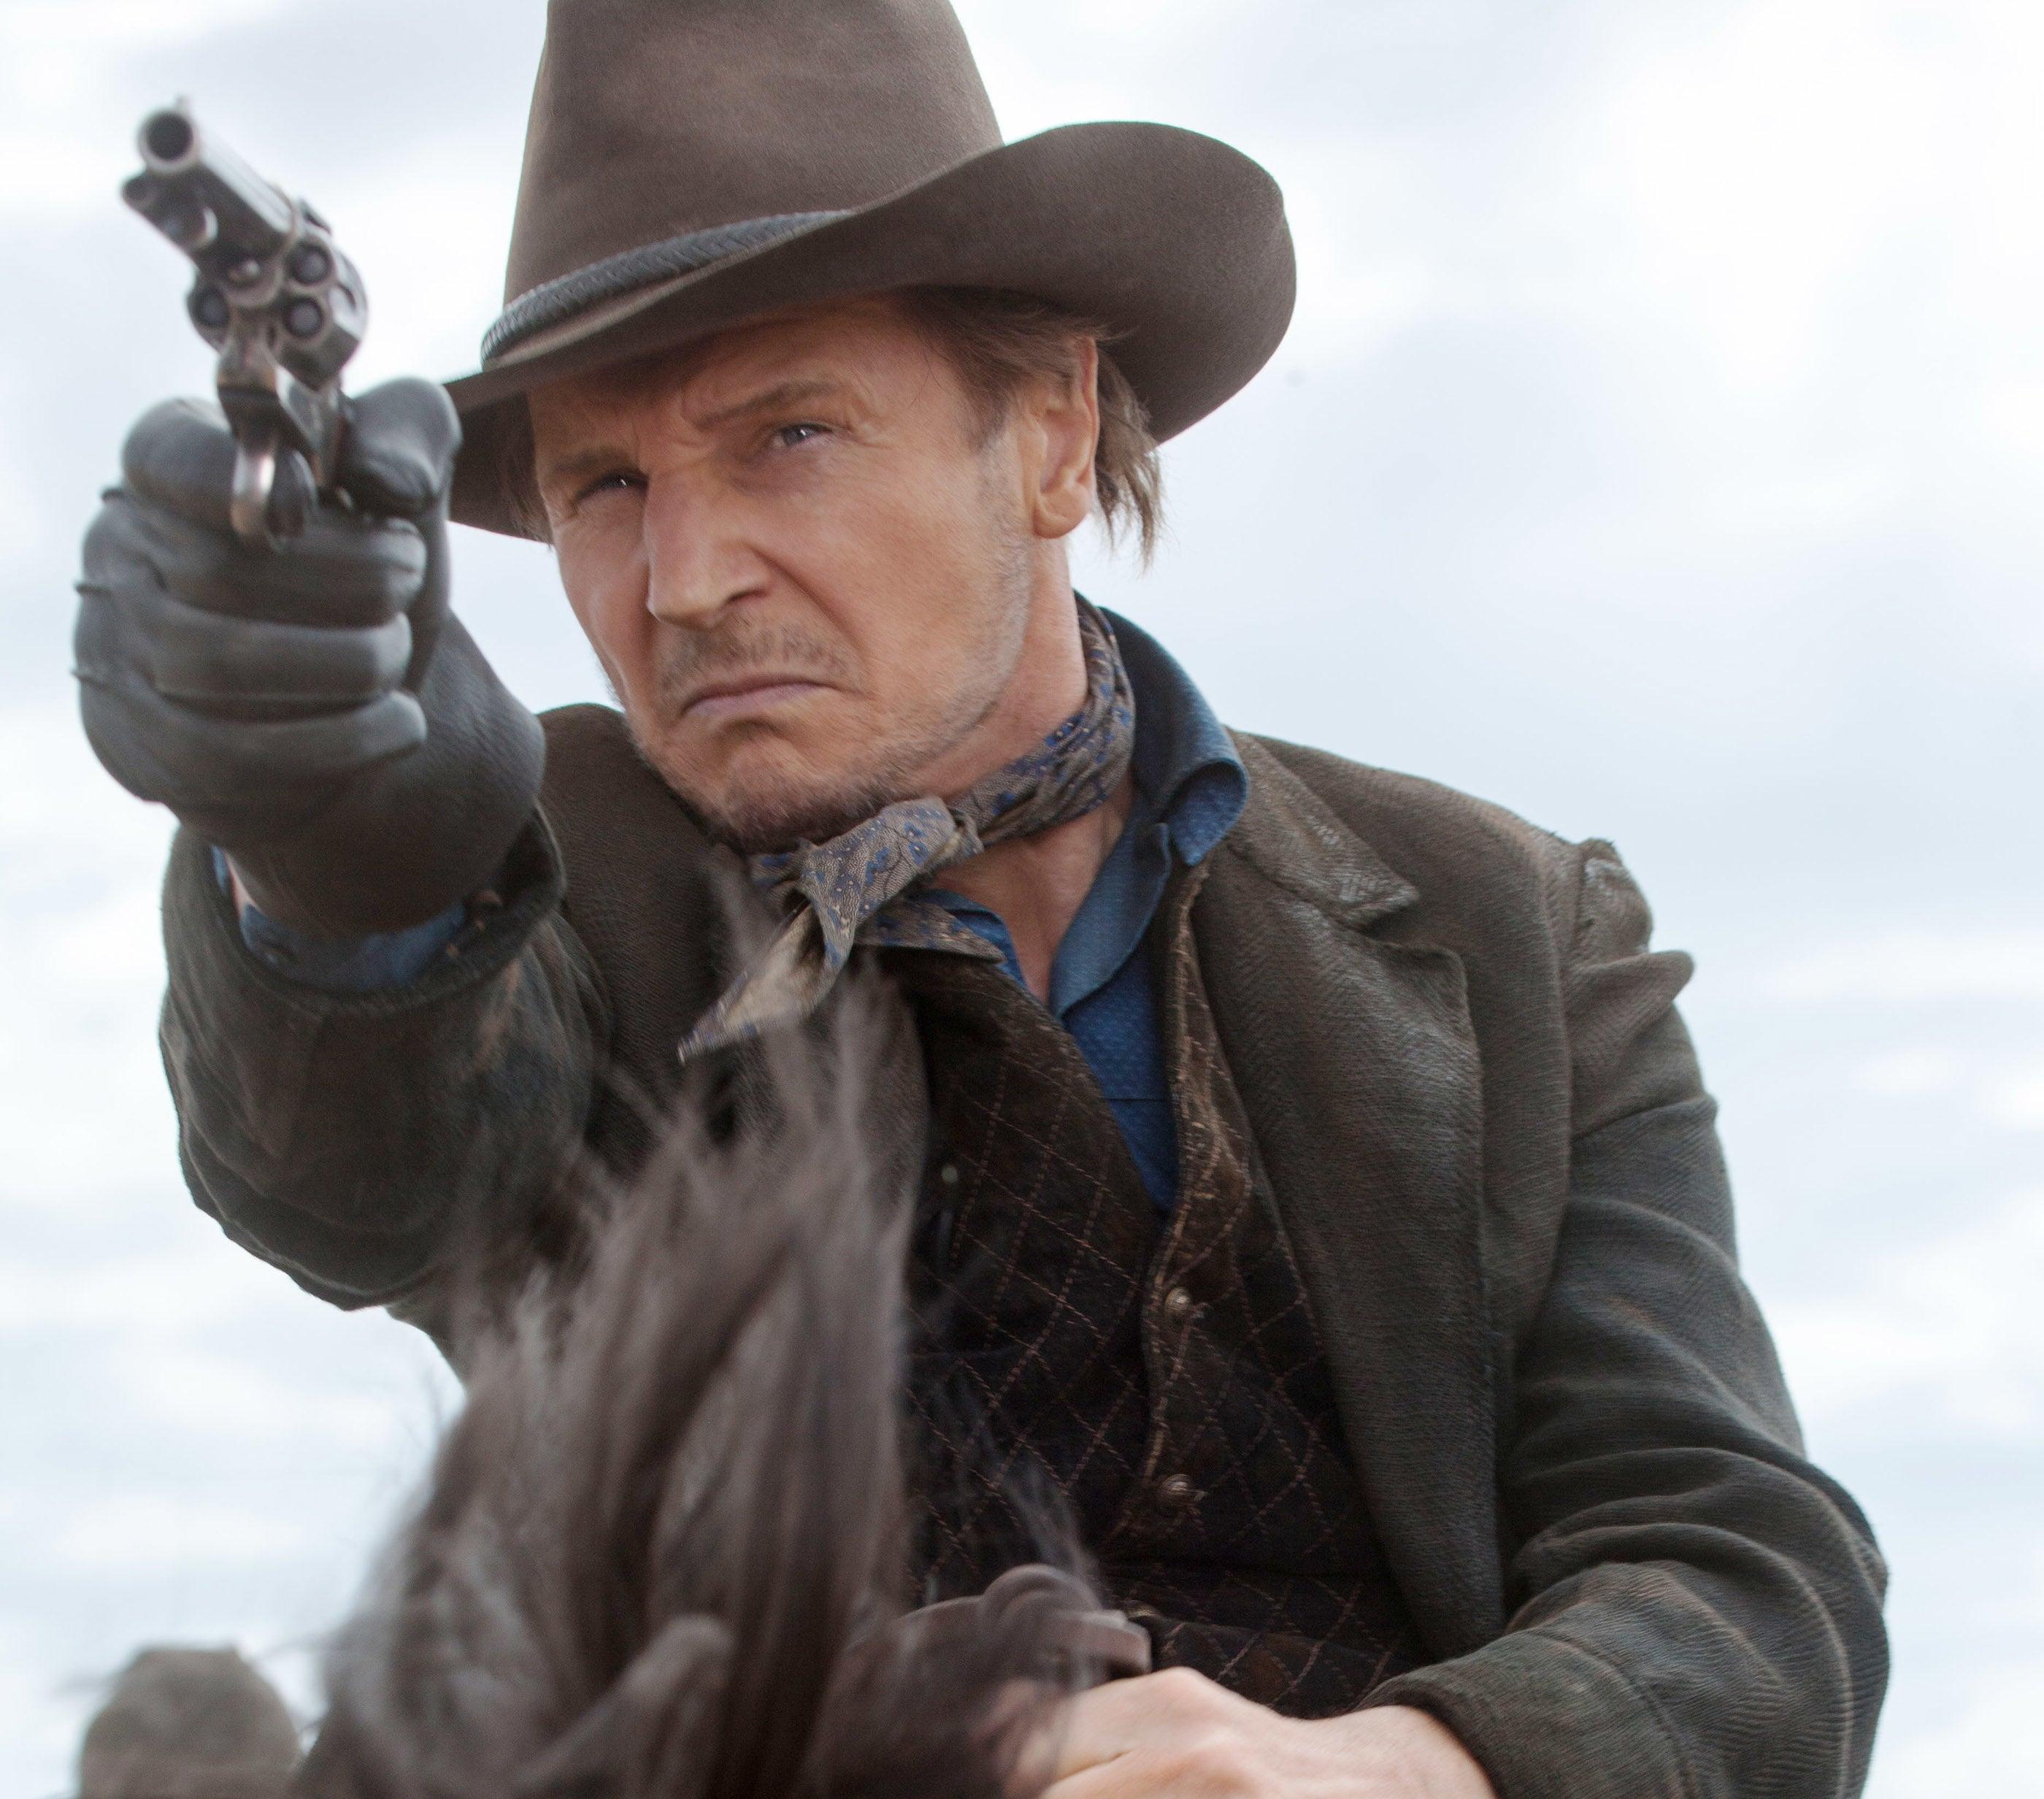 Neeson on horseback as the Irish outlaw